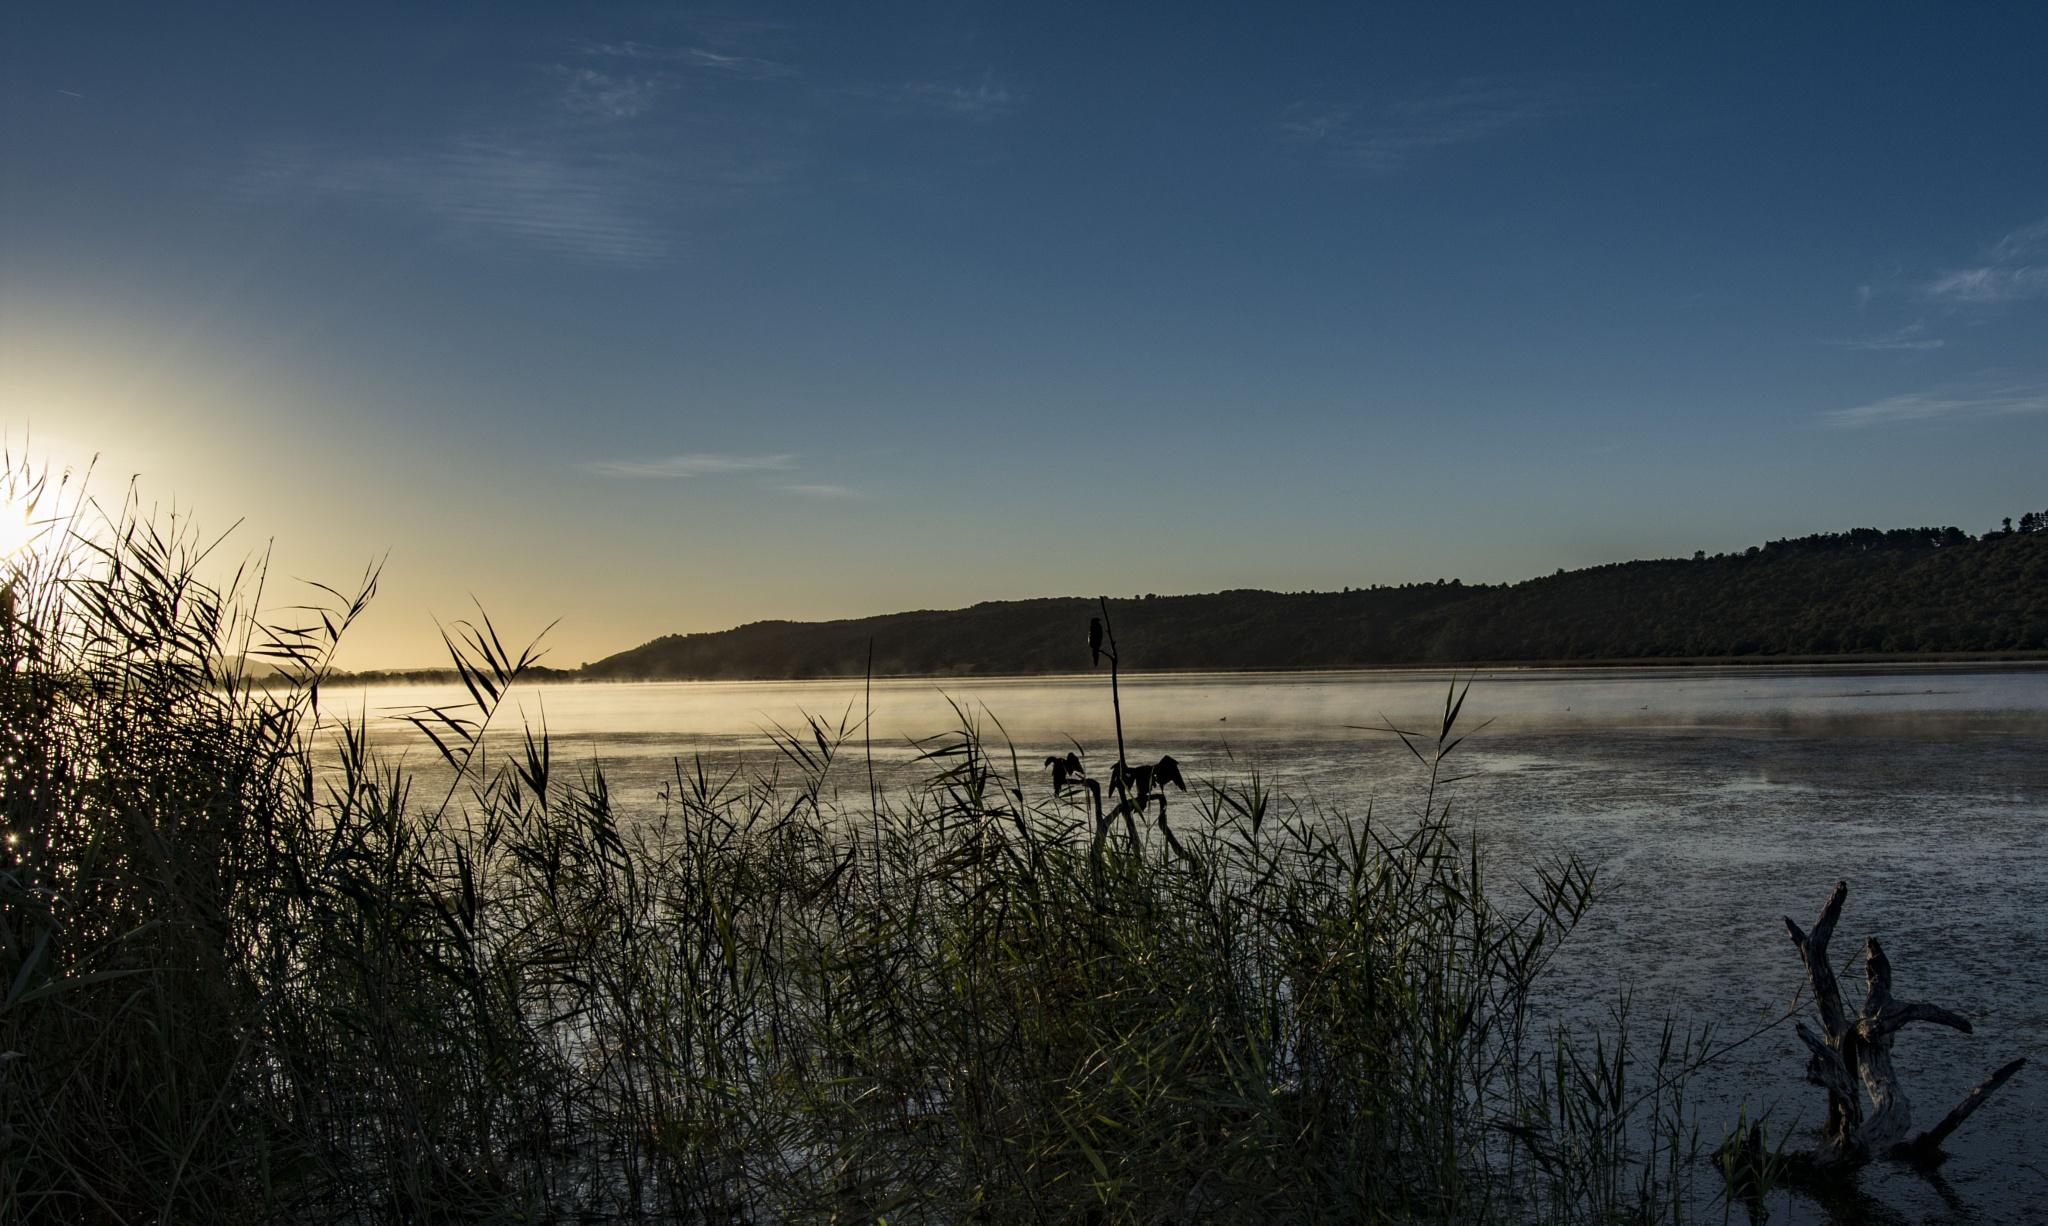 Misty Morning by Bennie Oberholzer